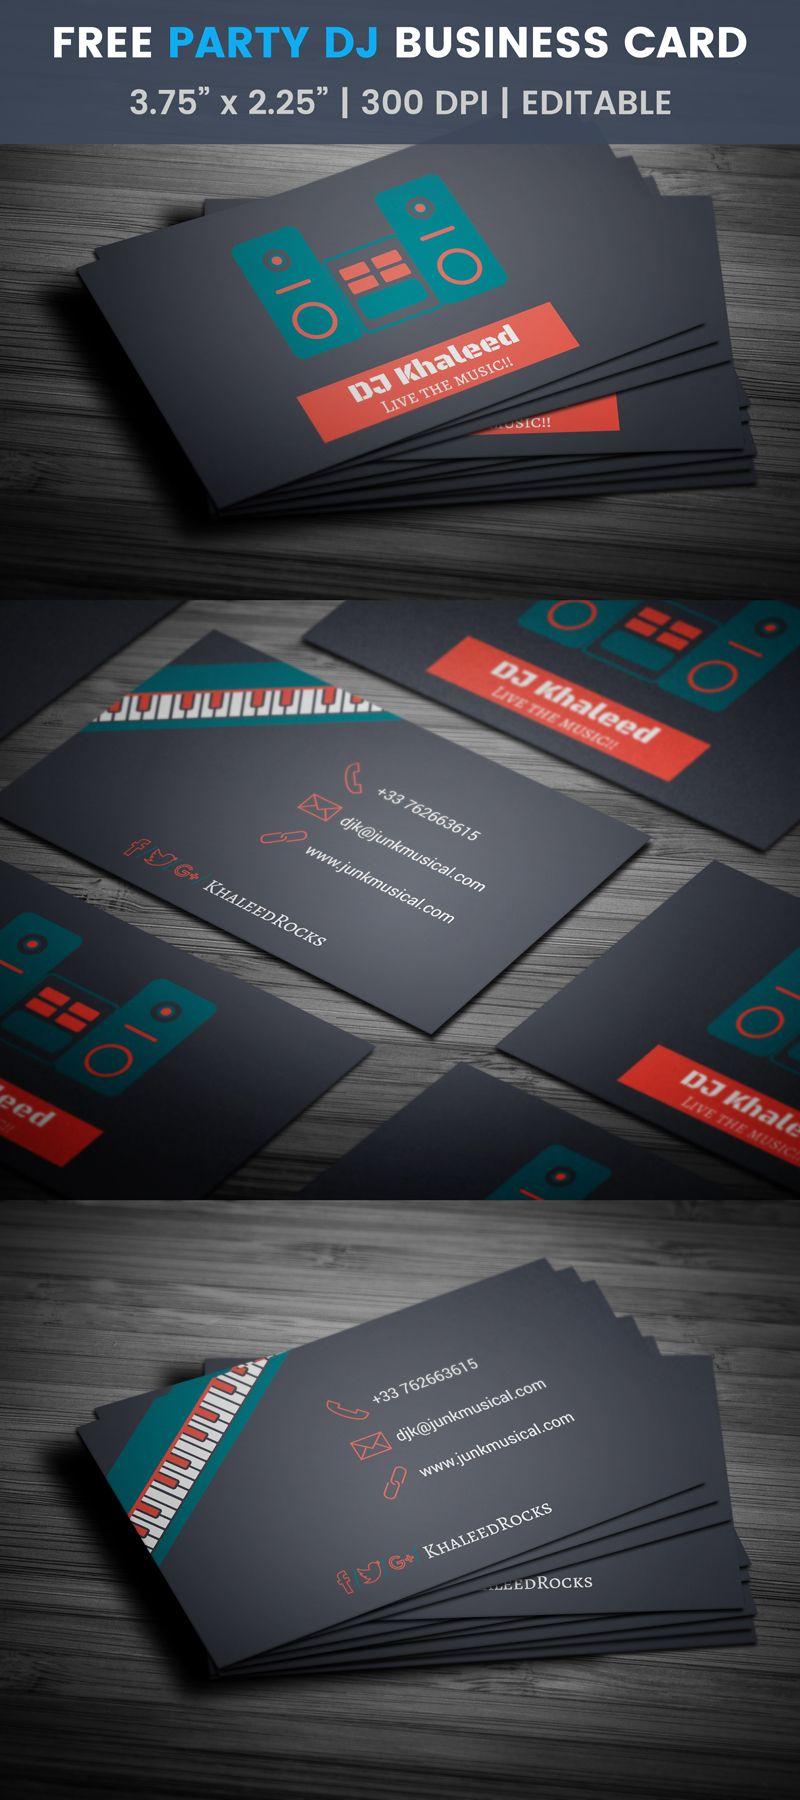 Party Dj Business Card Template Sj Sound Cassette Free Business